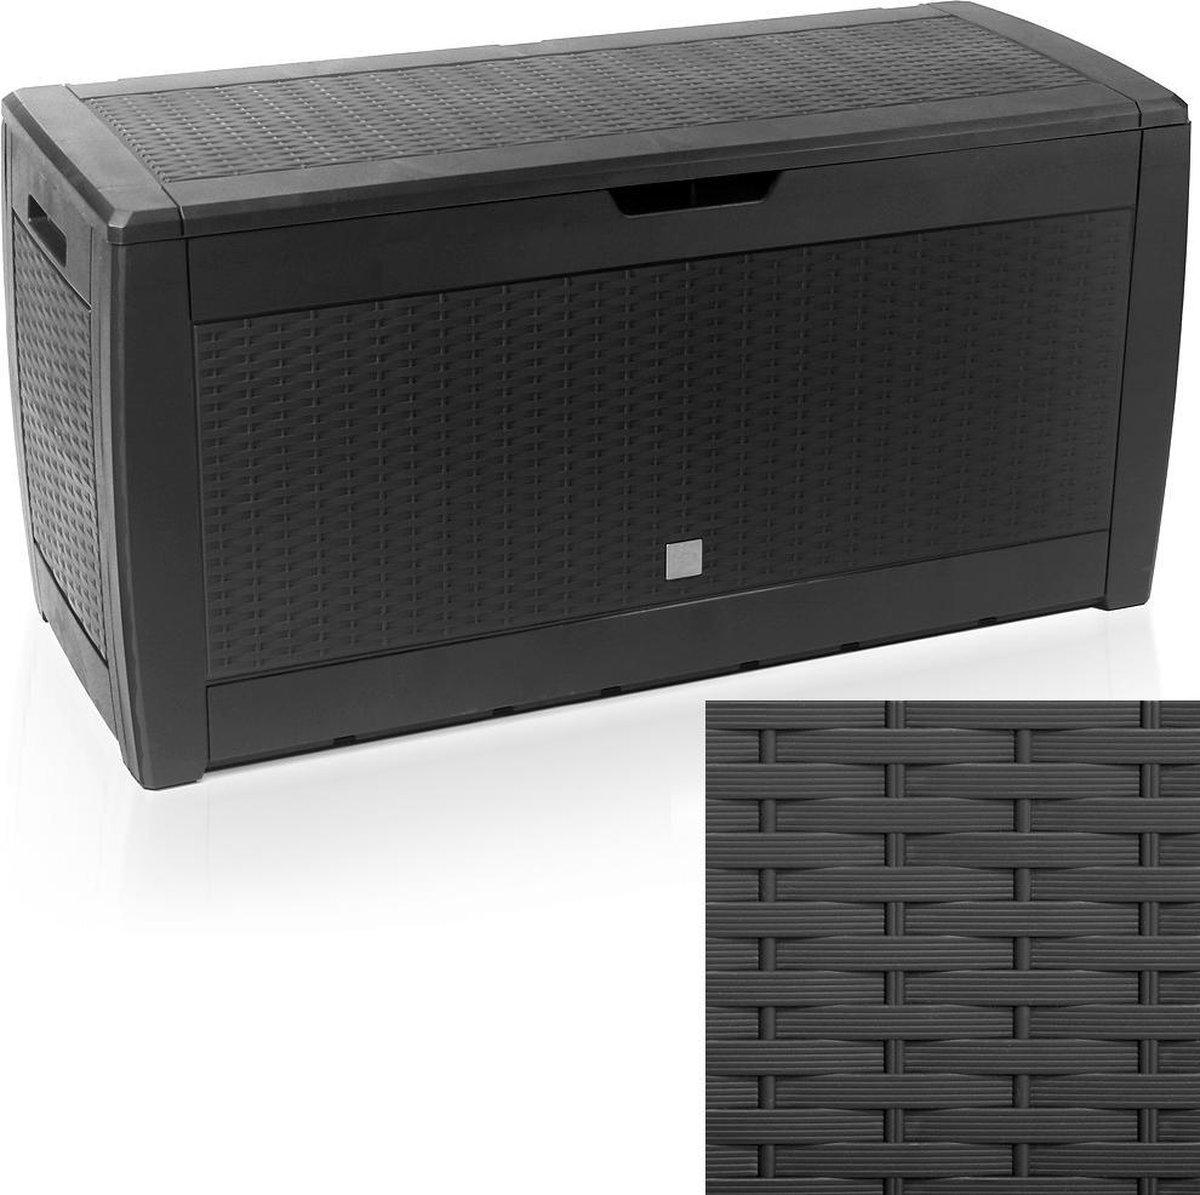 Tuin opbergbox - 310L - UV-bestendig - Antraciet